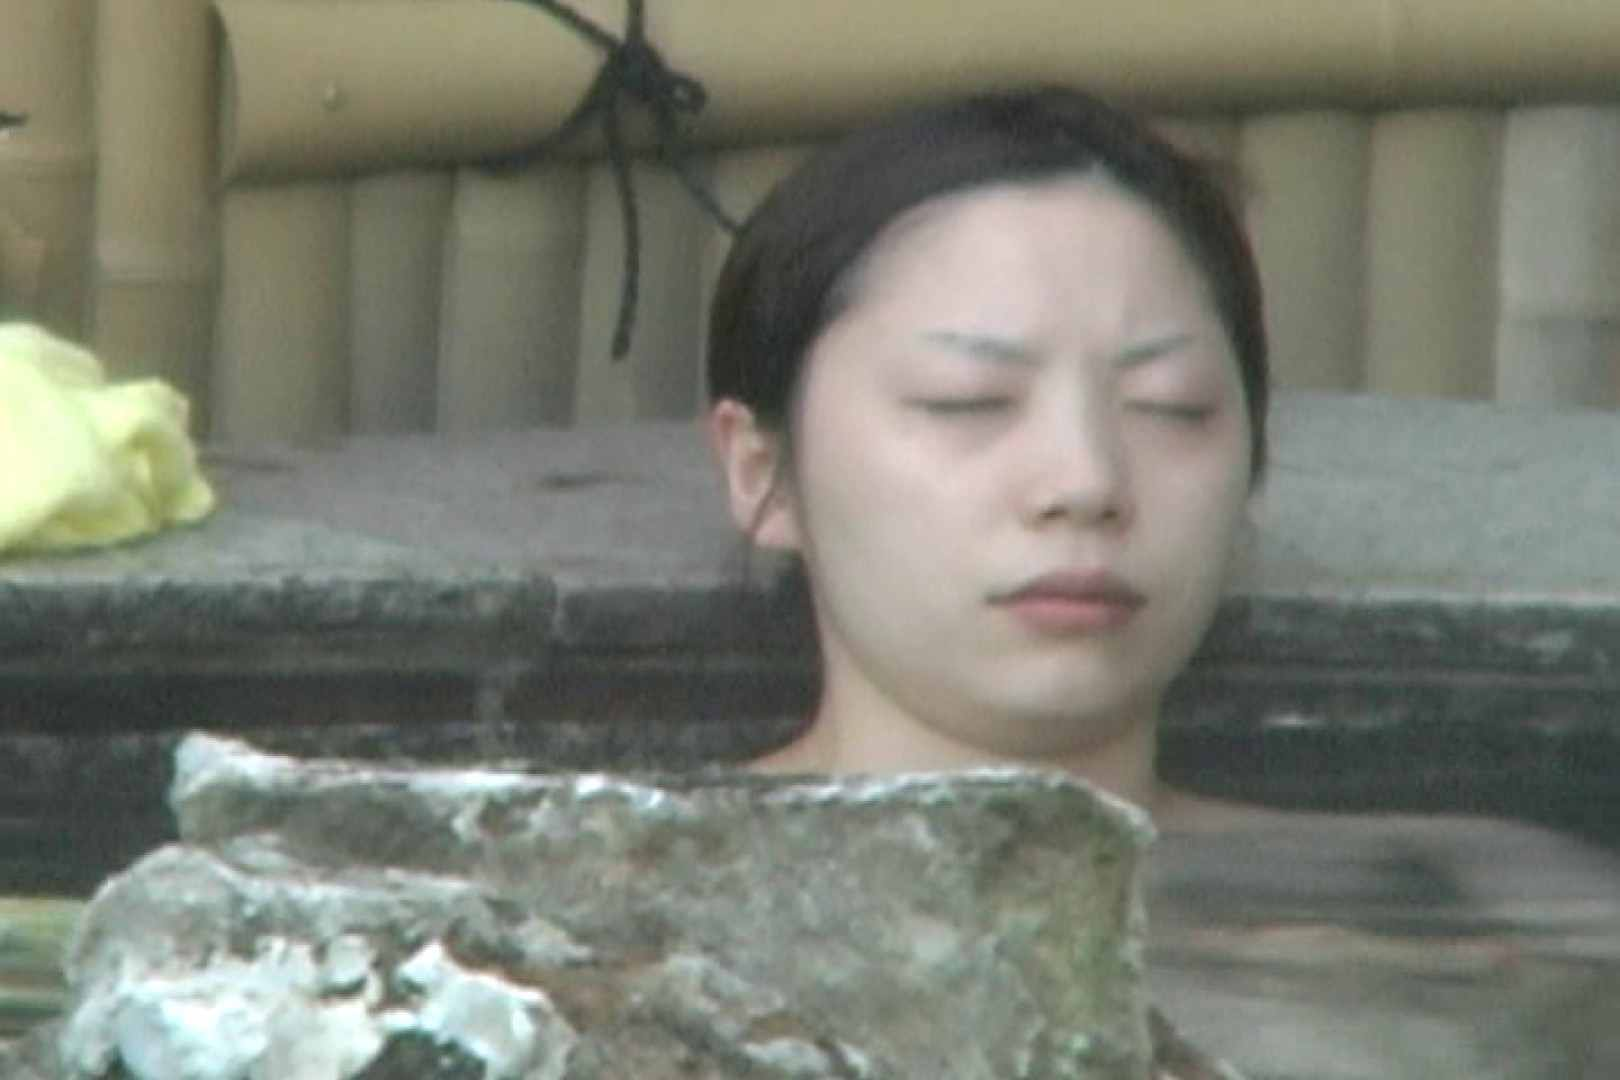 Aquaな露天風呂Vol.596 OLセックス  77画像 54